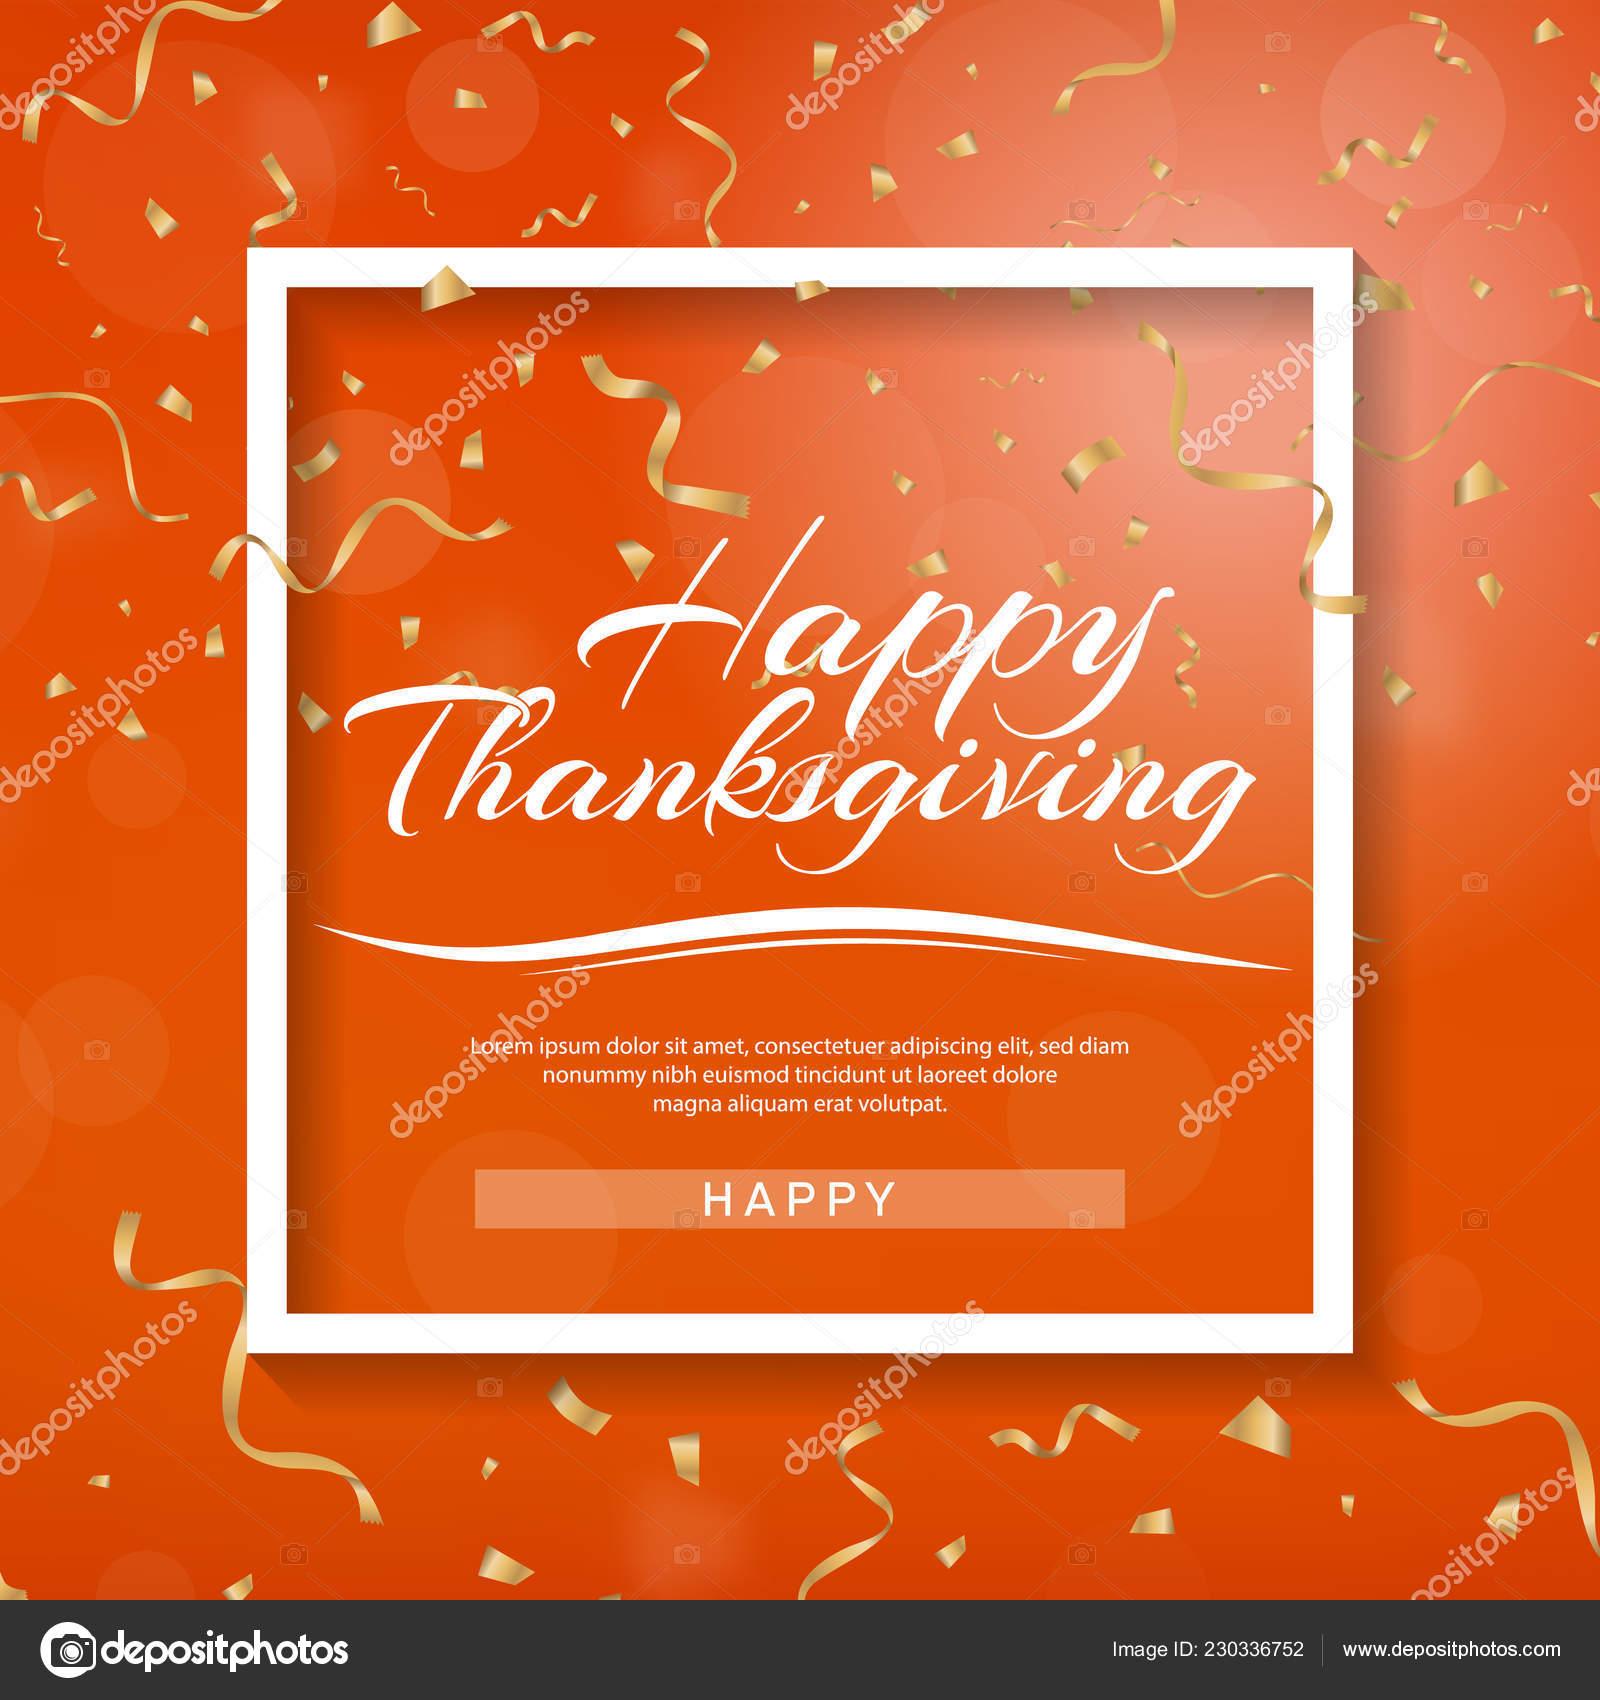 Happy Thanksgiving Banner Invitation Design Thanksgiving